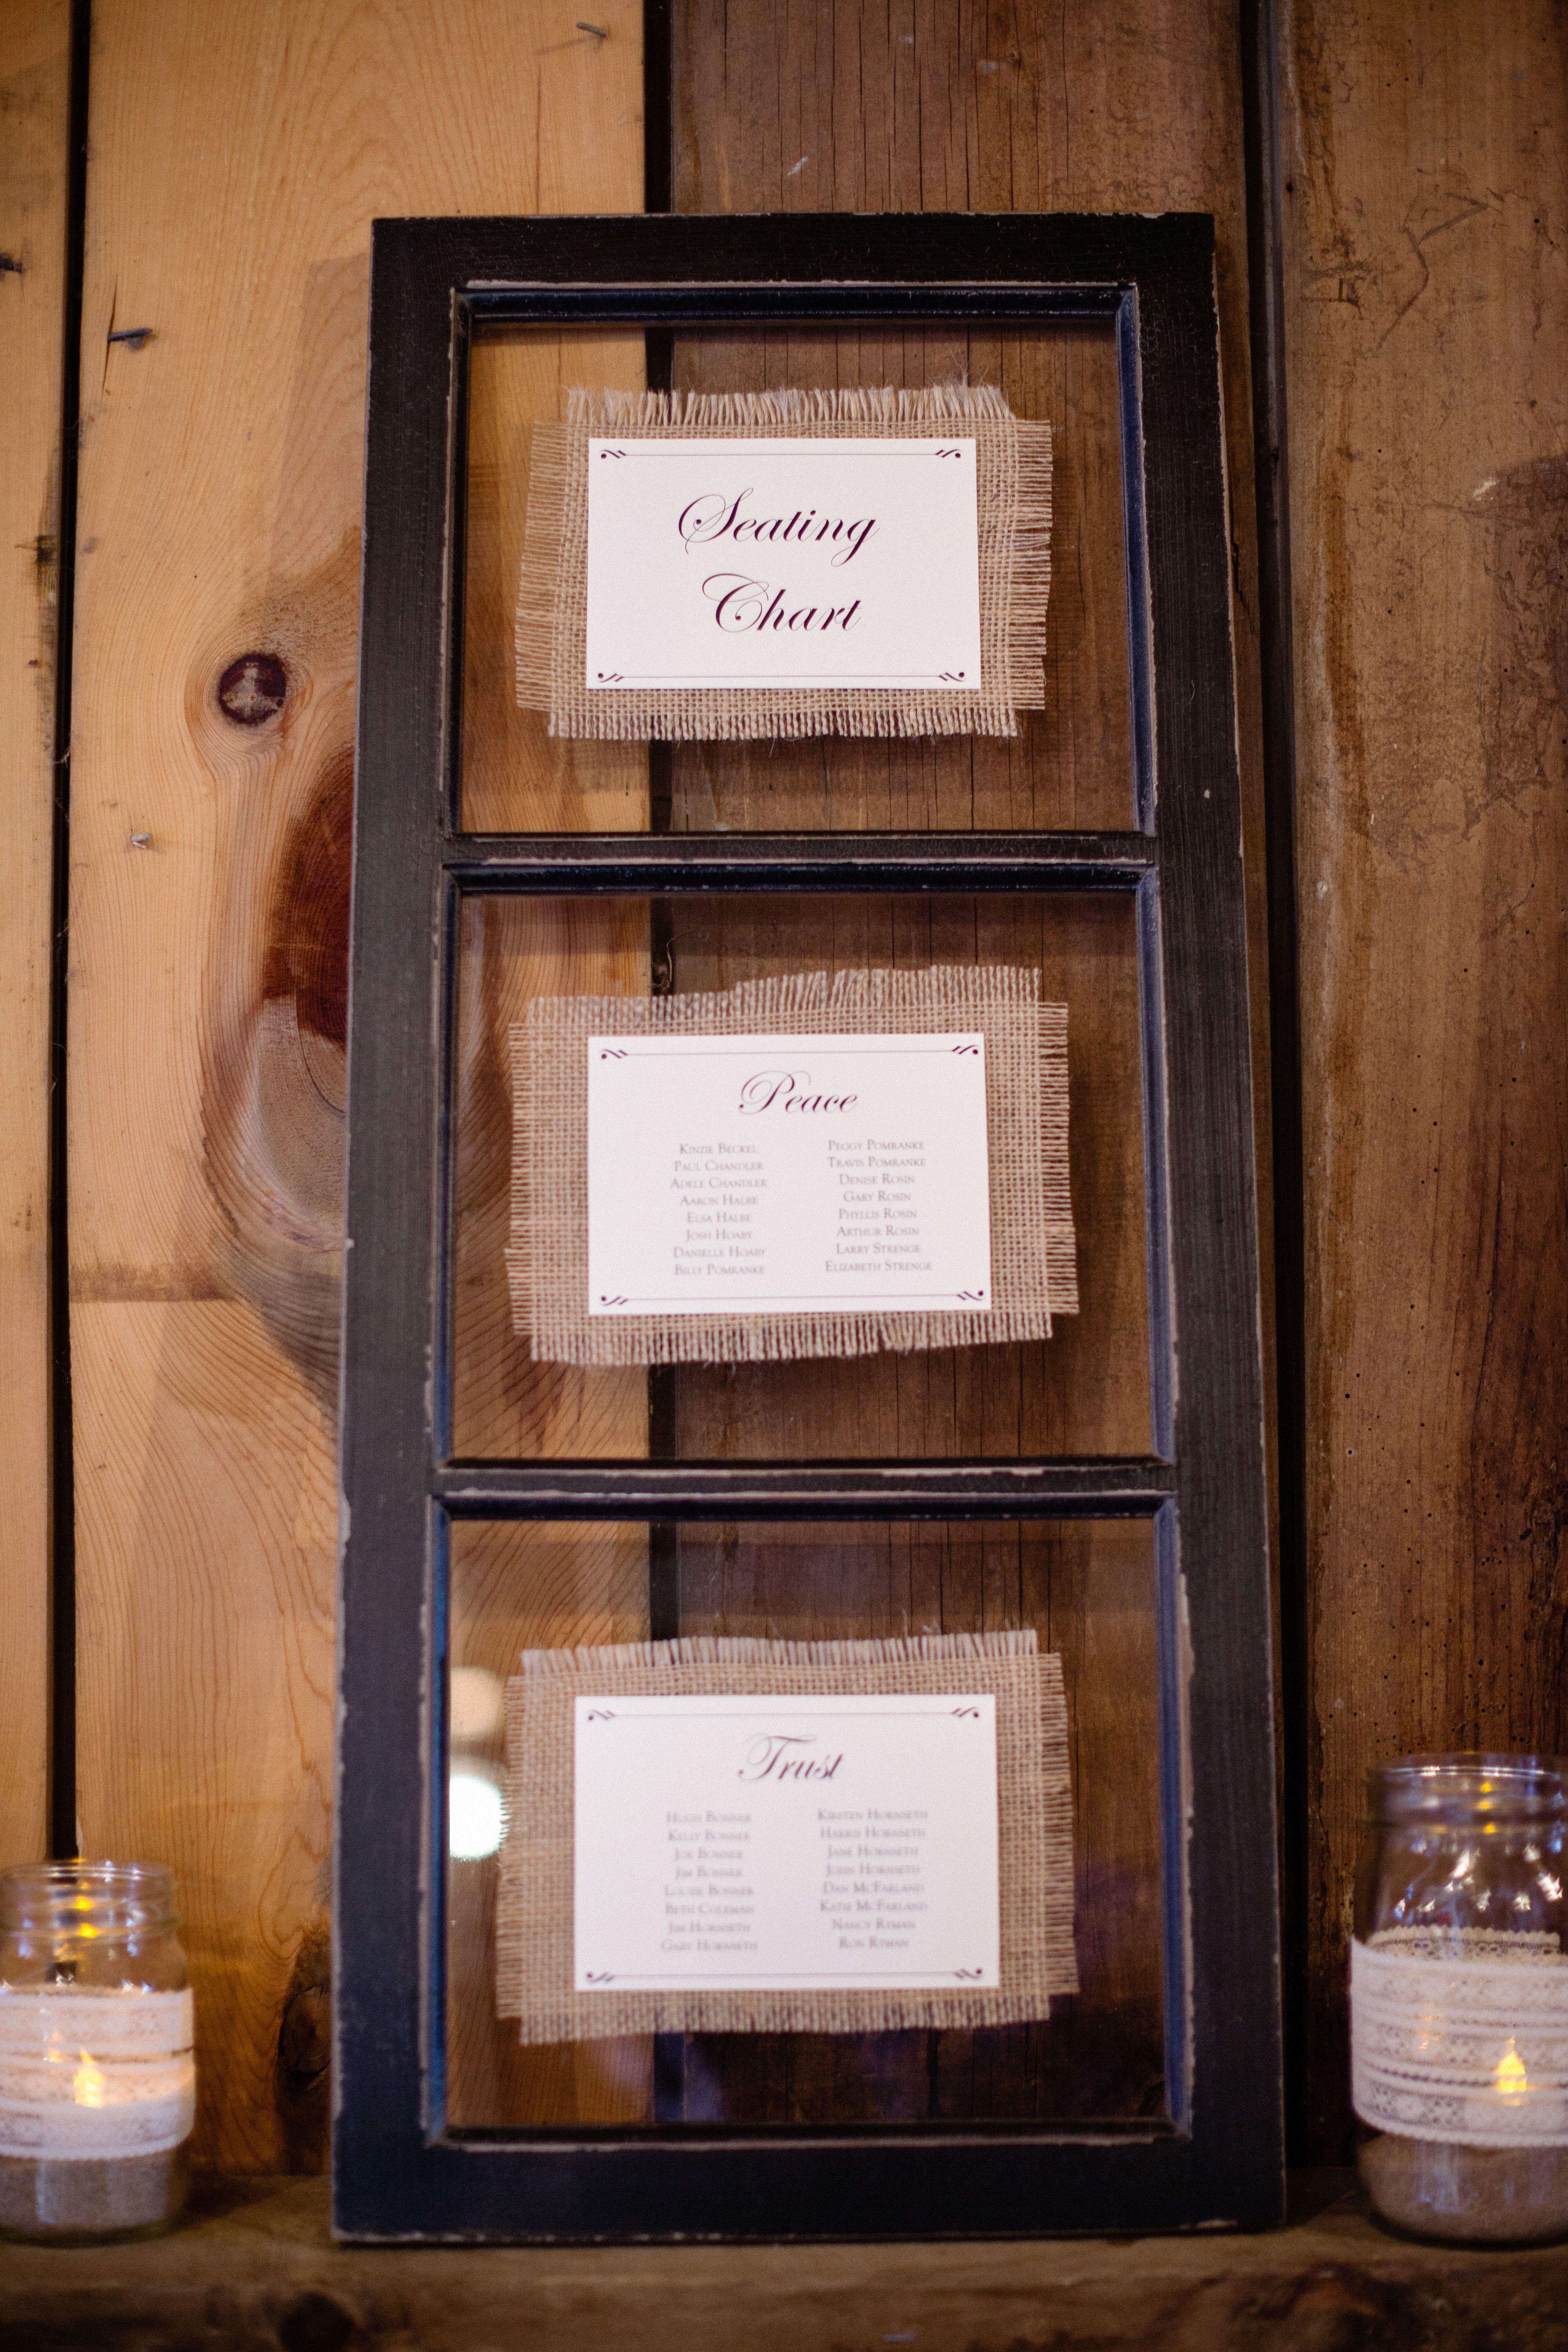 Window pane ideas  window pane seating chart  wedding seating charts u table numbers